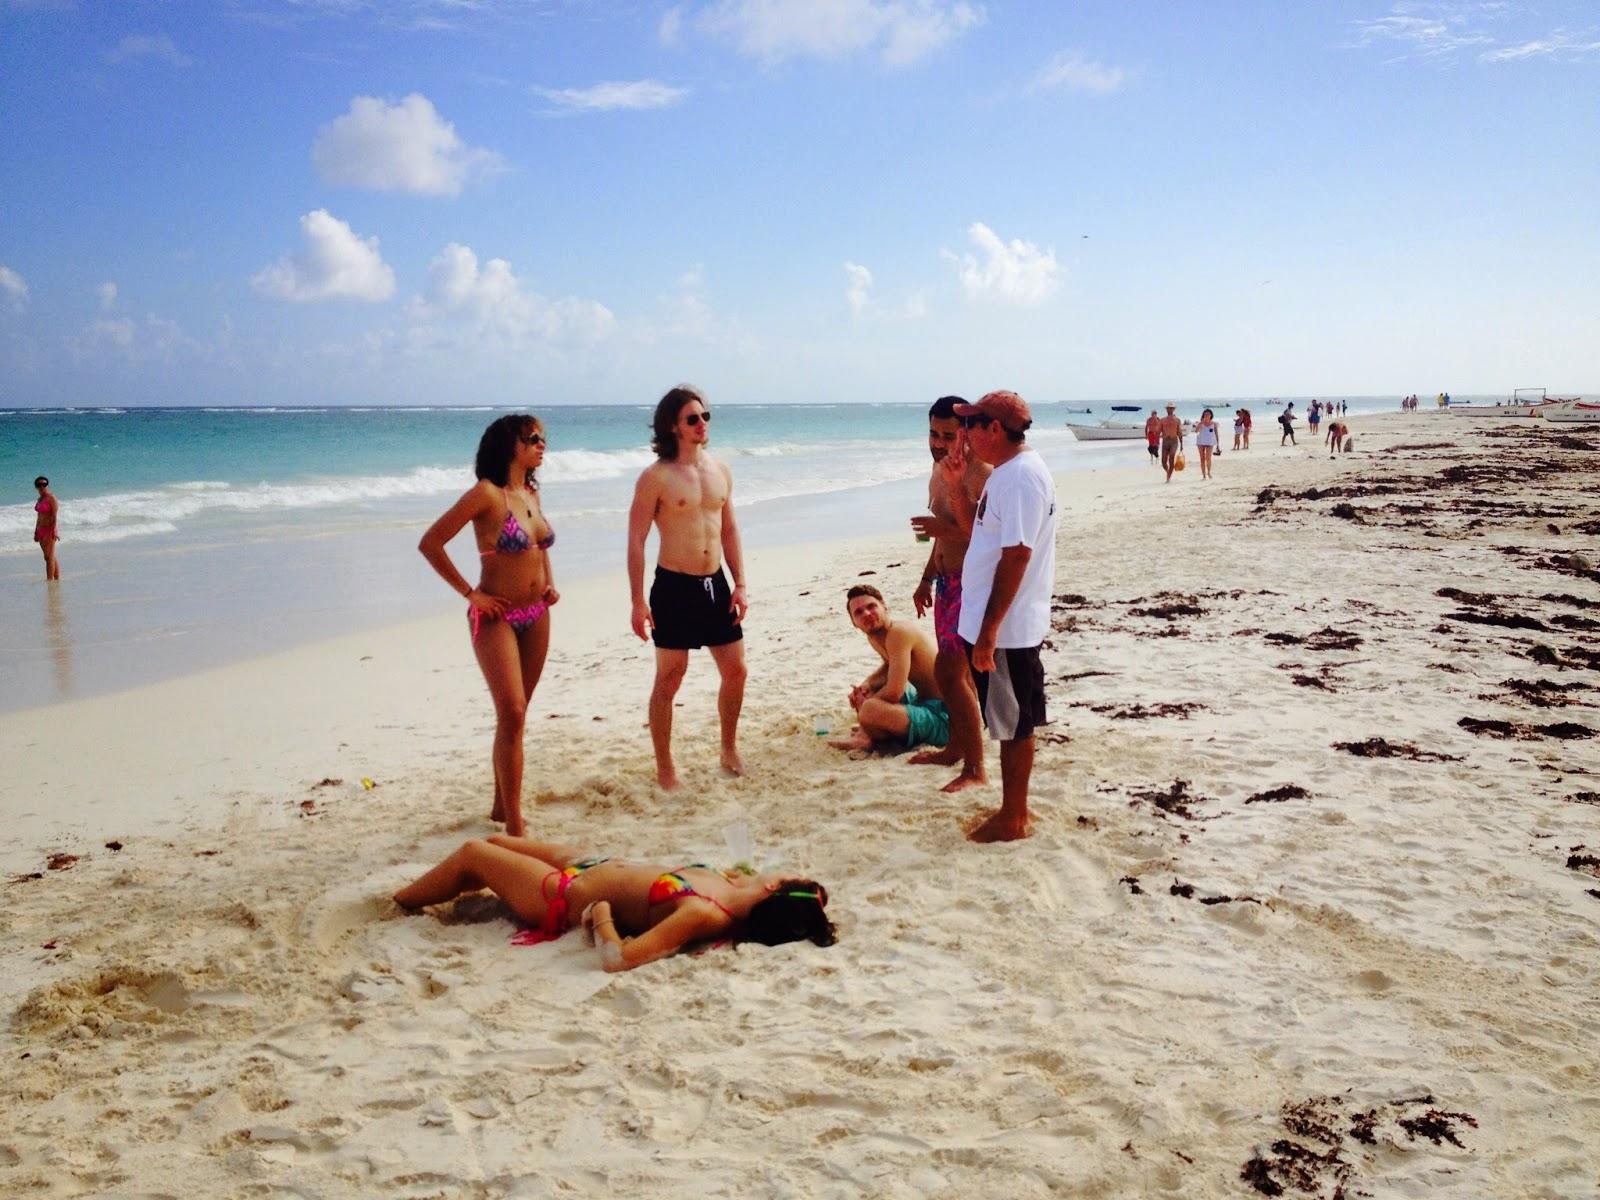 tulum ocean bpm festival stereo night club friends playa del carmen mexico travel more